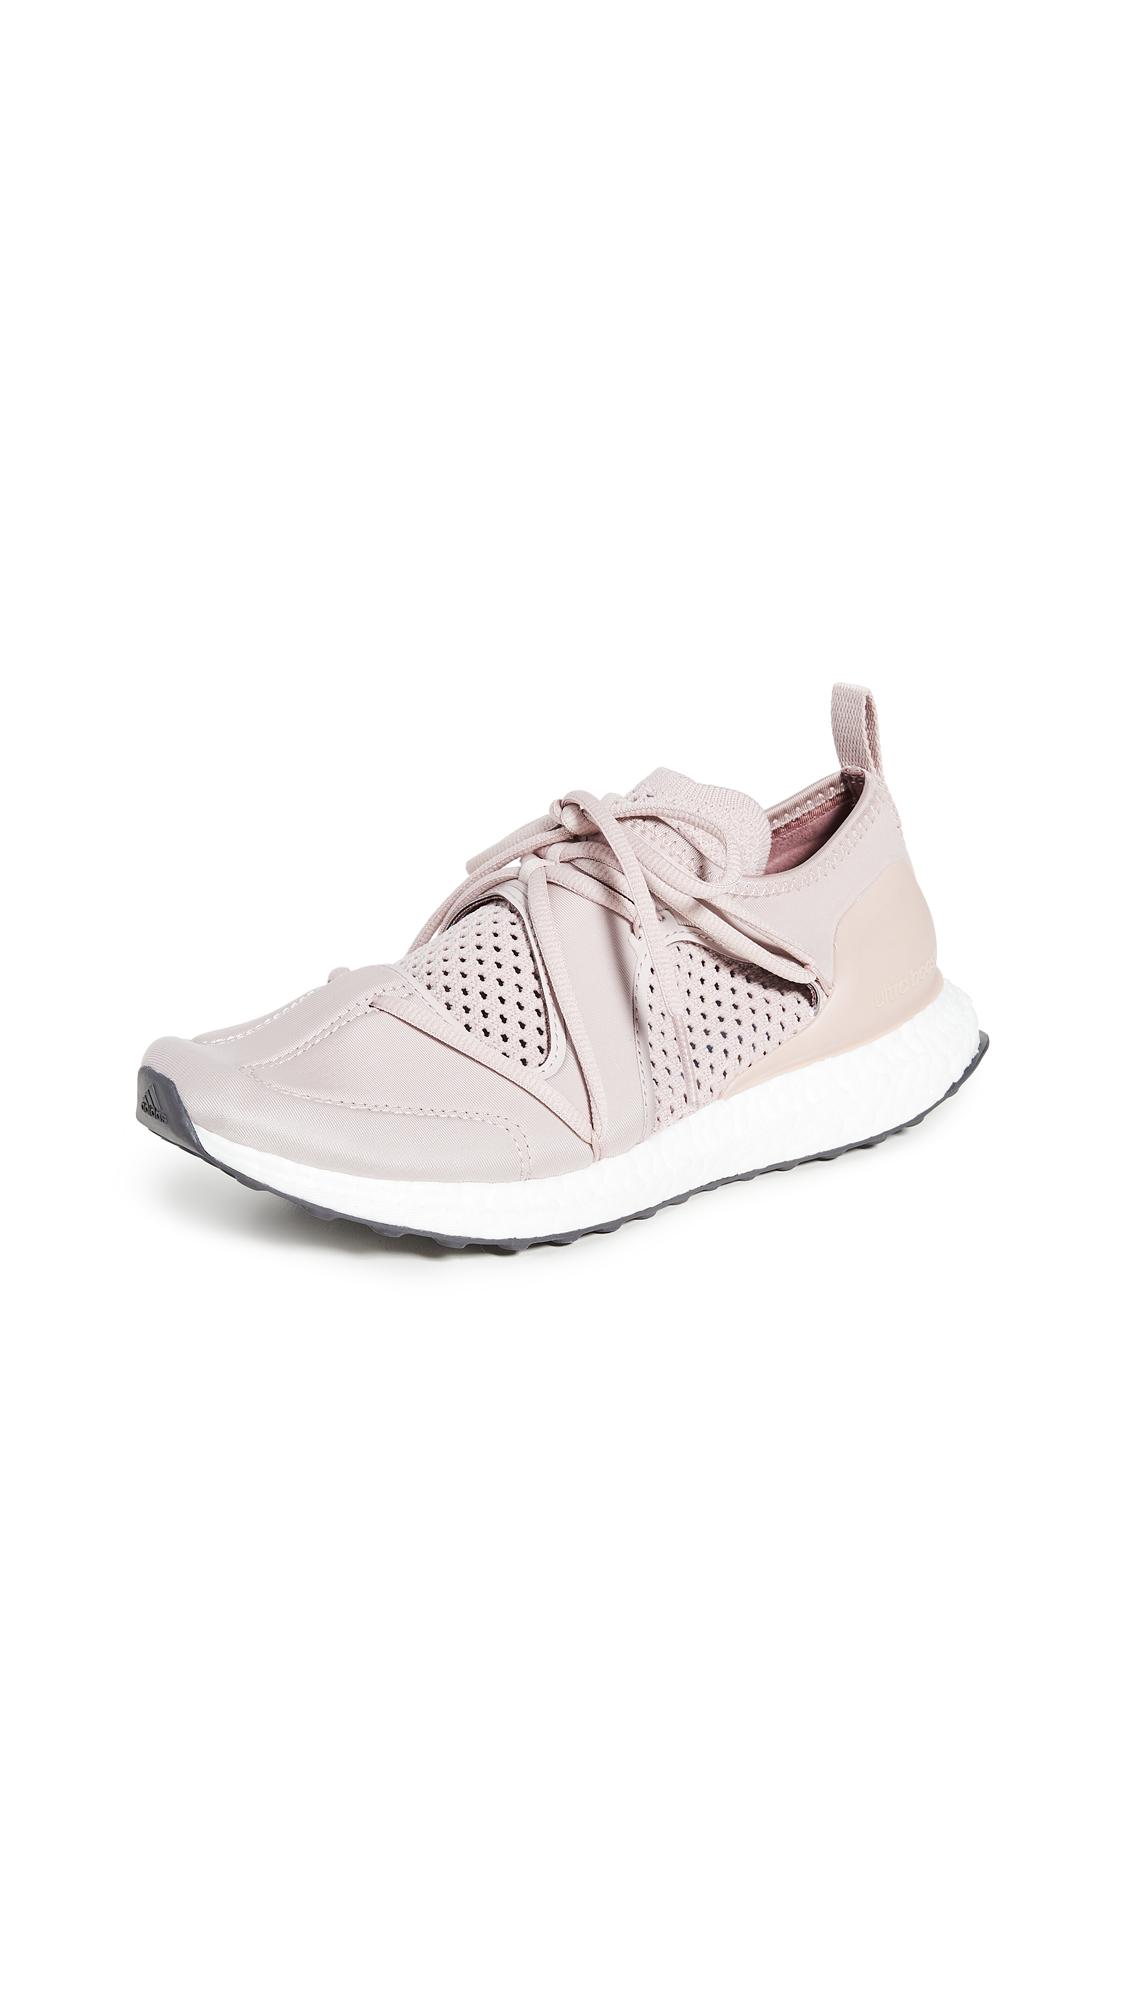 Buy adidas by Stella McCartney Ultraboost T.S. Sneakers online, shop adidas by Stella McCartney